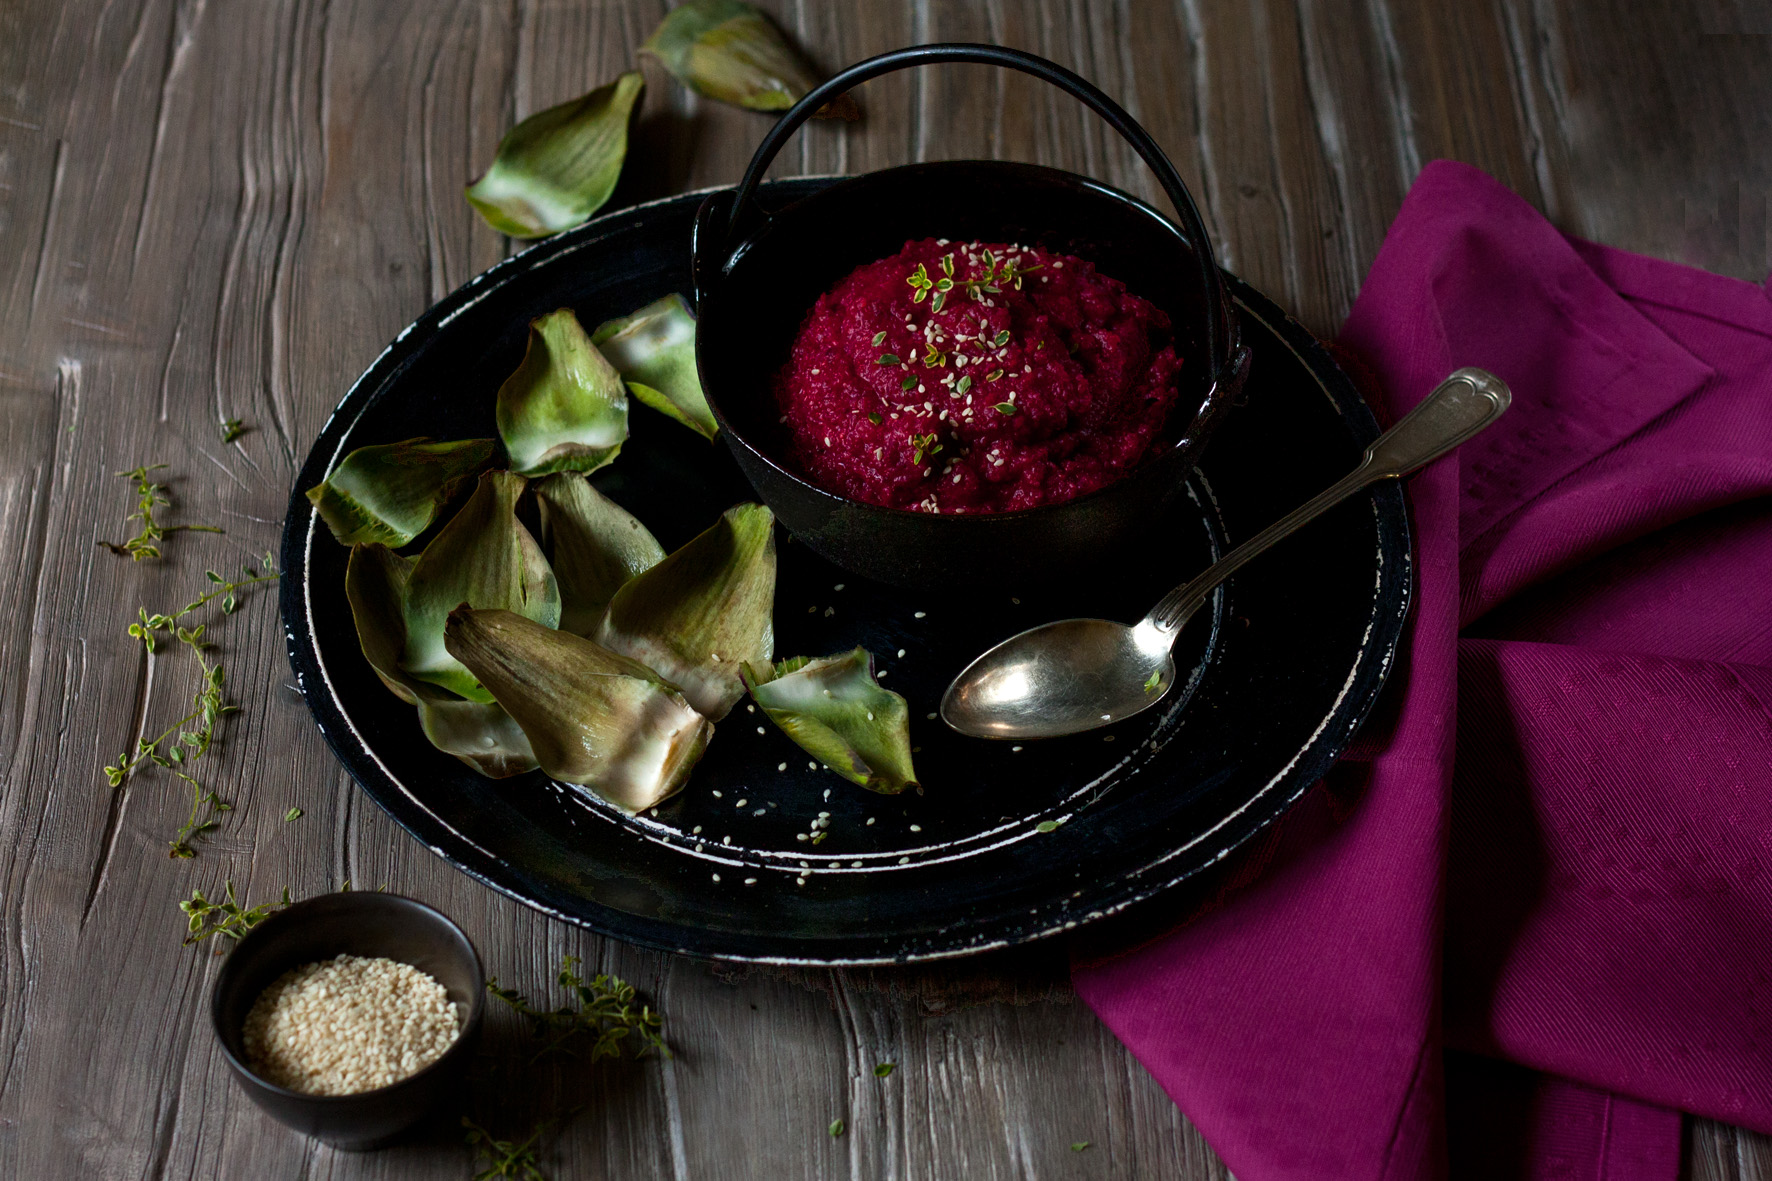 artischocken-rote-beete-hummus-2